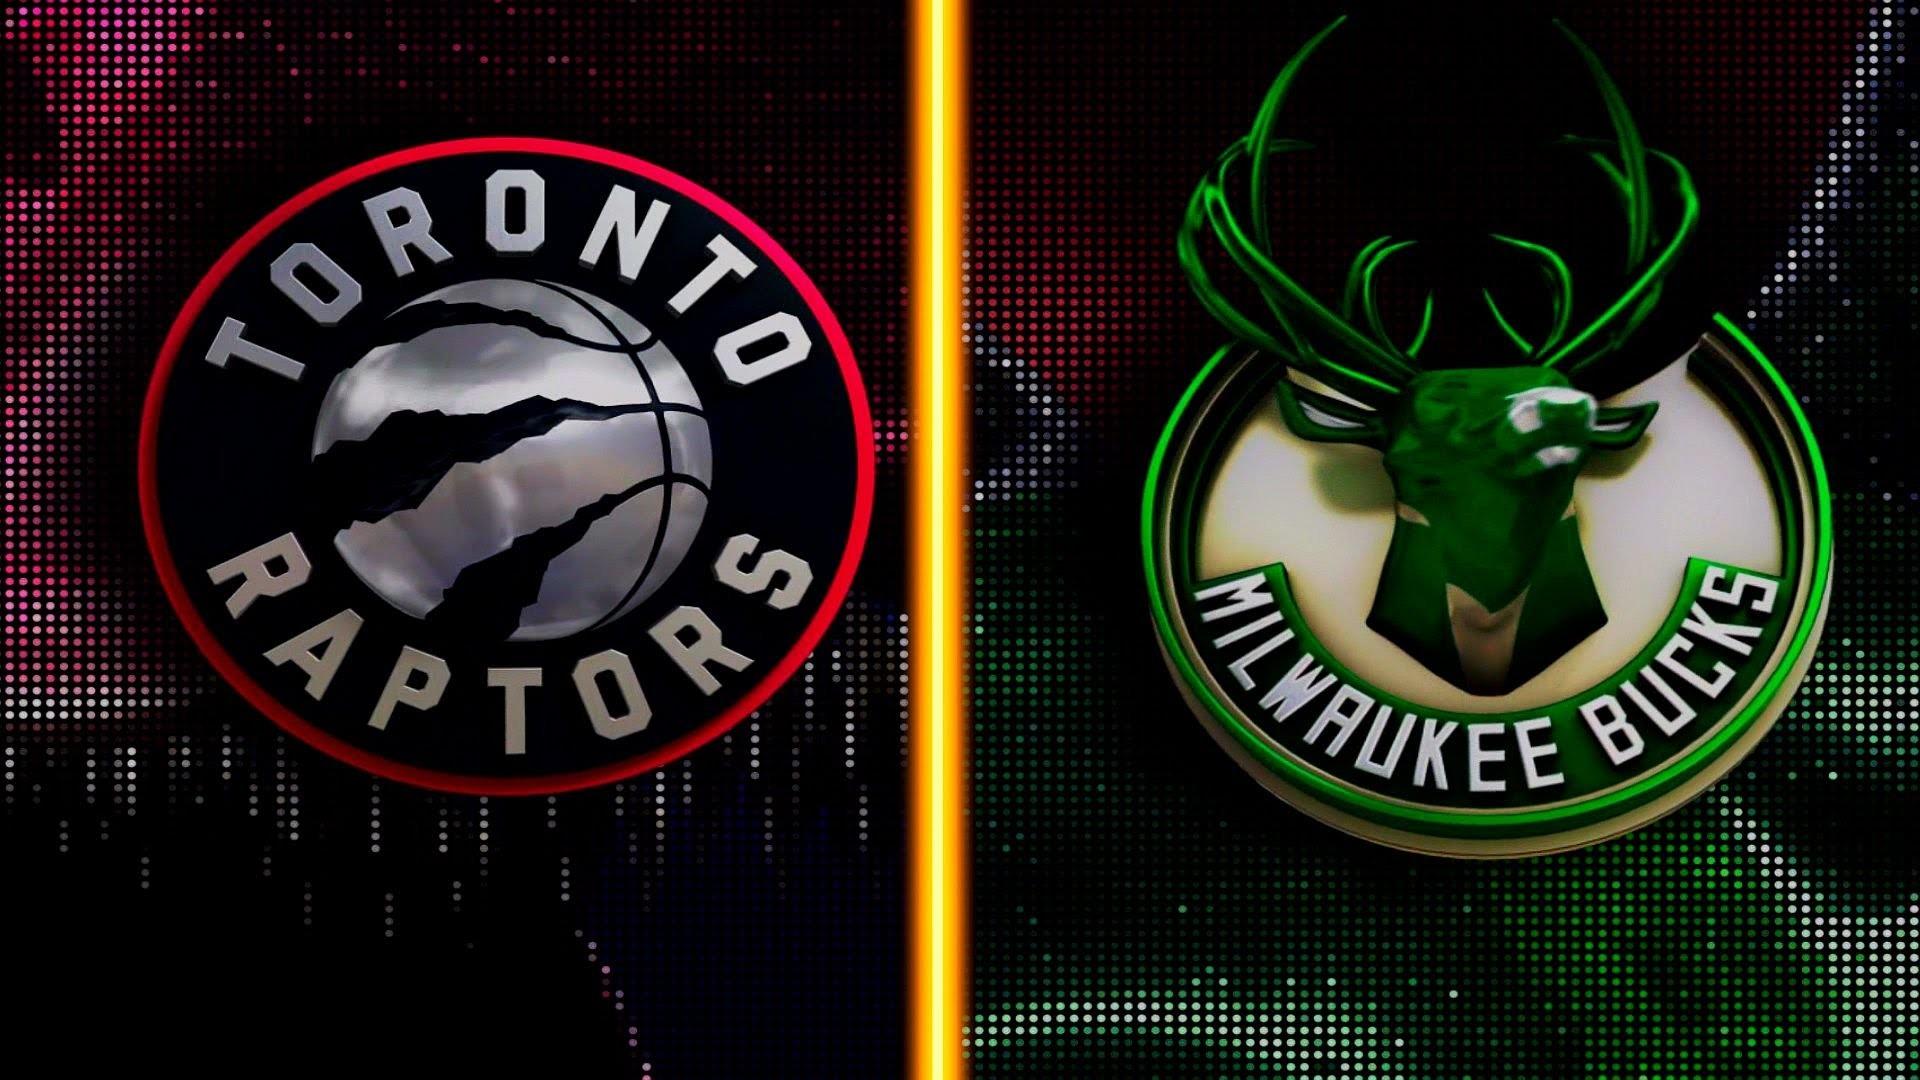 PS4: NBA 2K16 – Toronto Raptors vs. Milwaukee Bucks [1080p 60 FPS] – YouTube